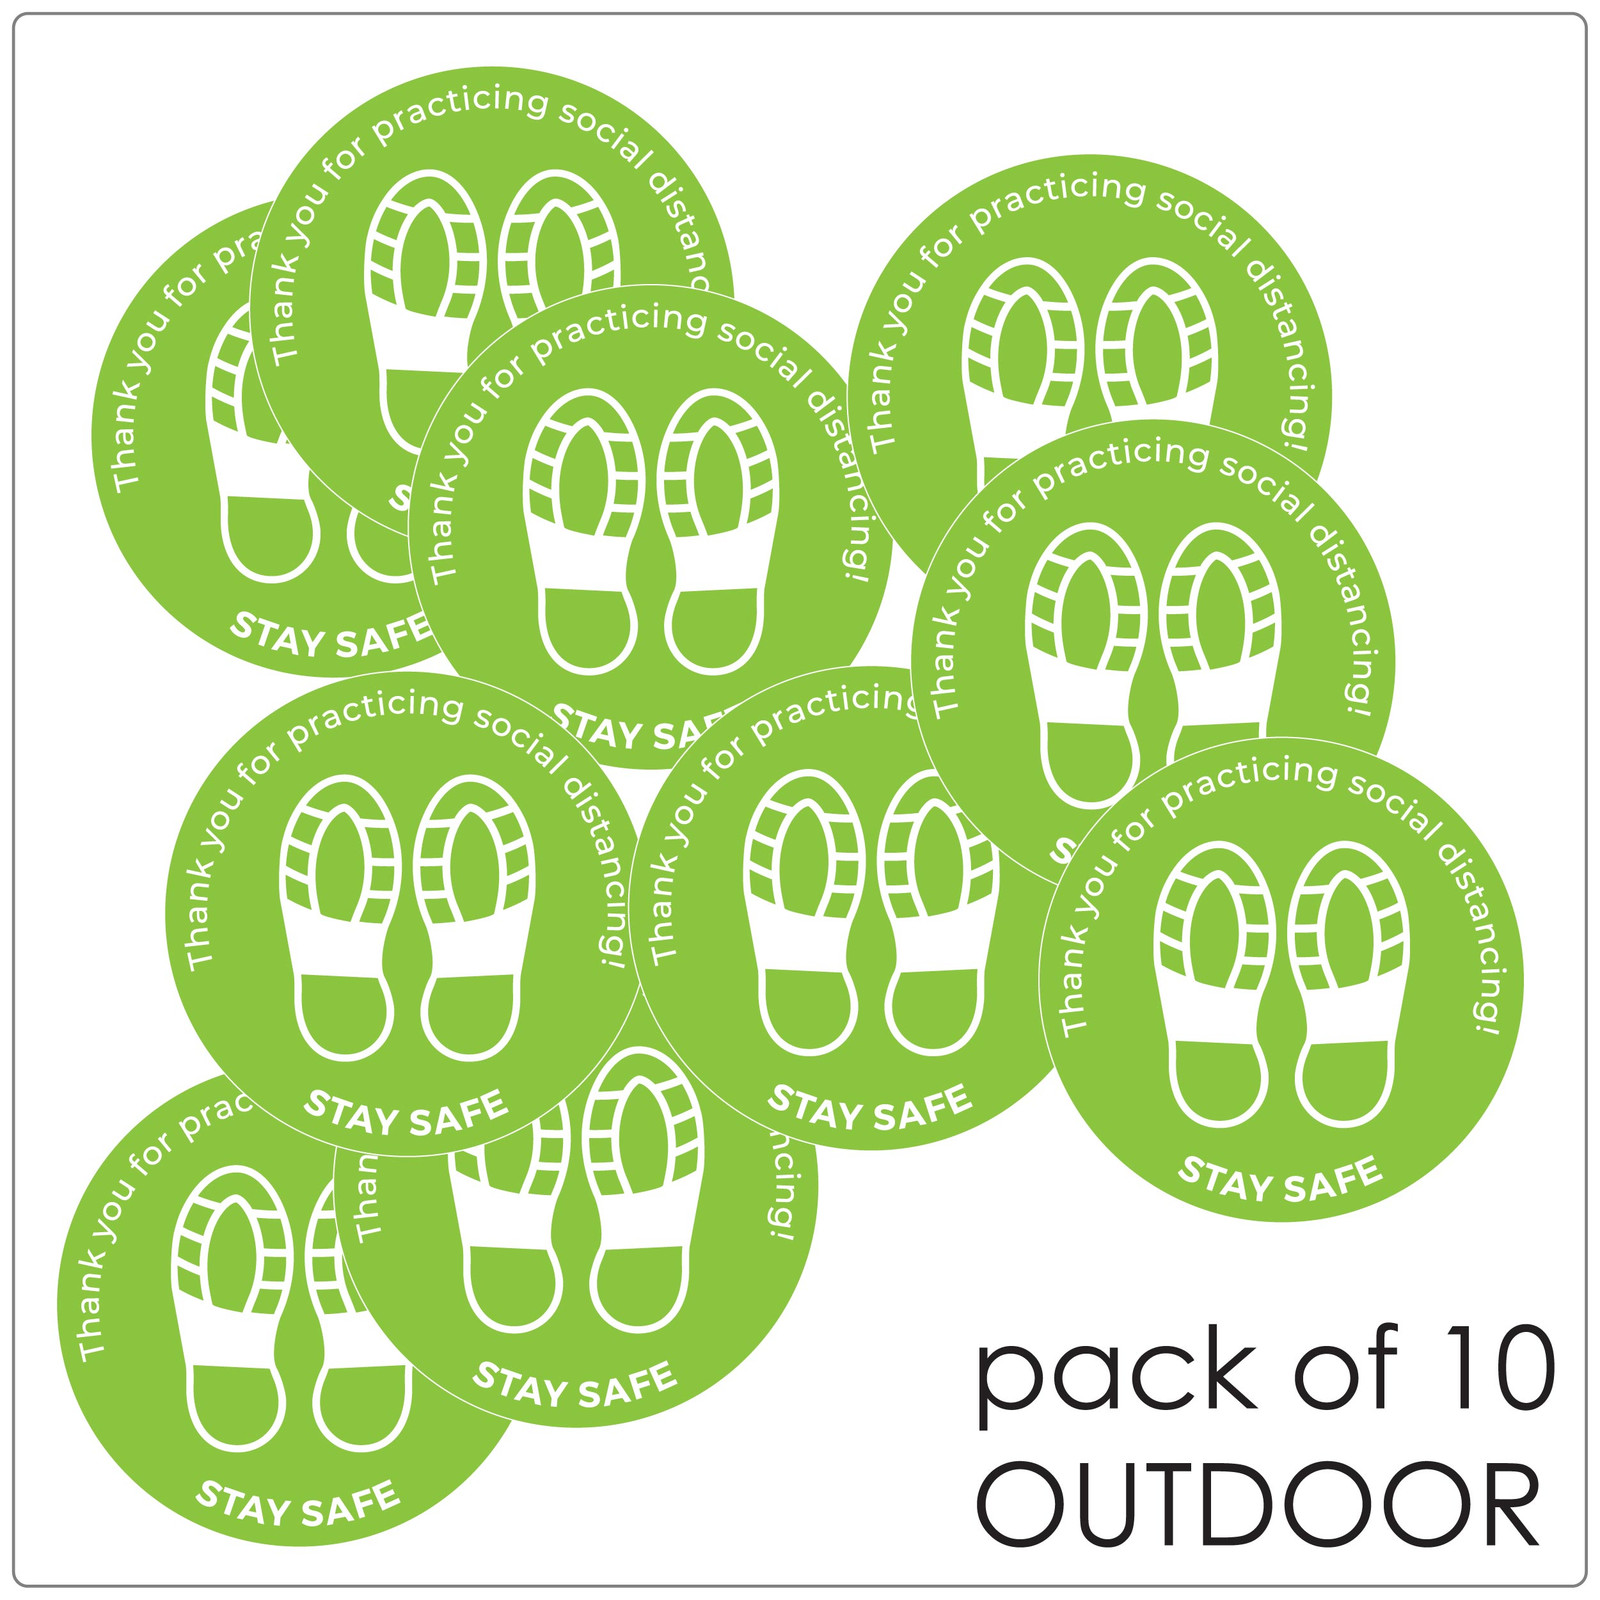 social distancing floor sticker for outdoor floors, pack of 10 Self-adhesive Corona virus floor sticker to help social distancing.